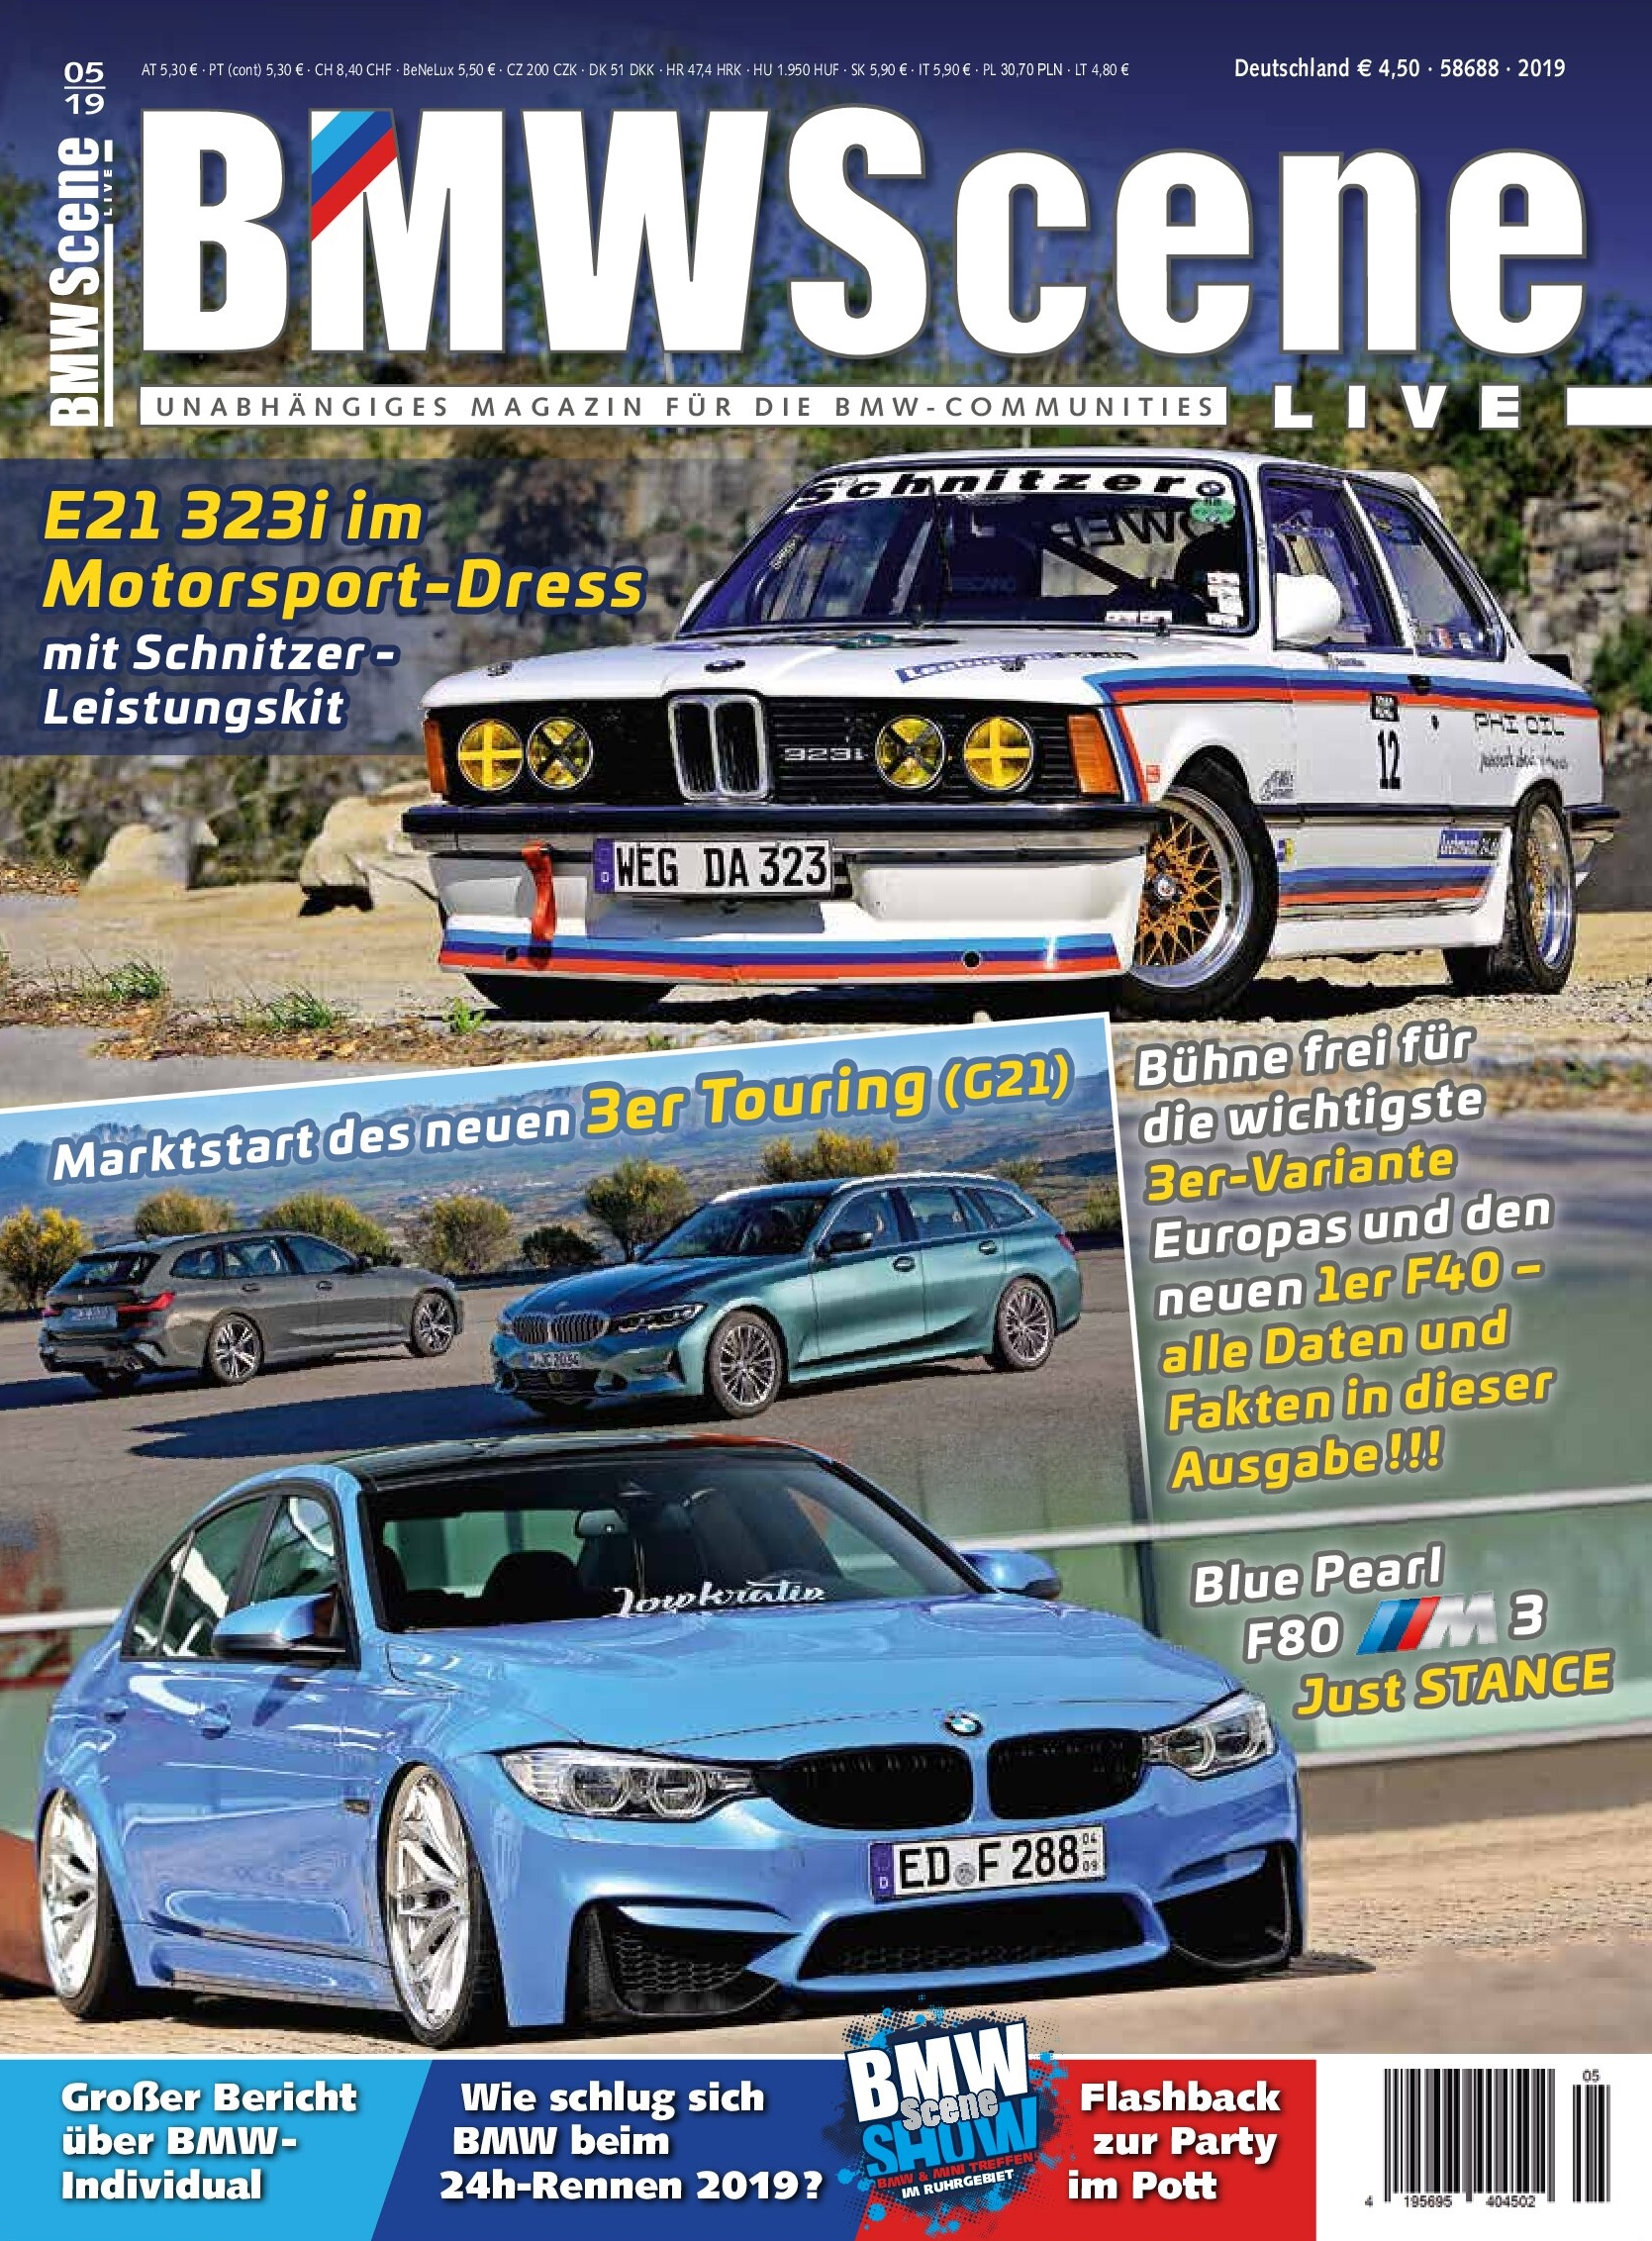 BMW Scene Magazin 5/2019